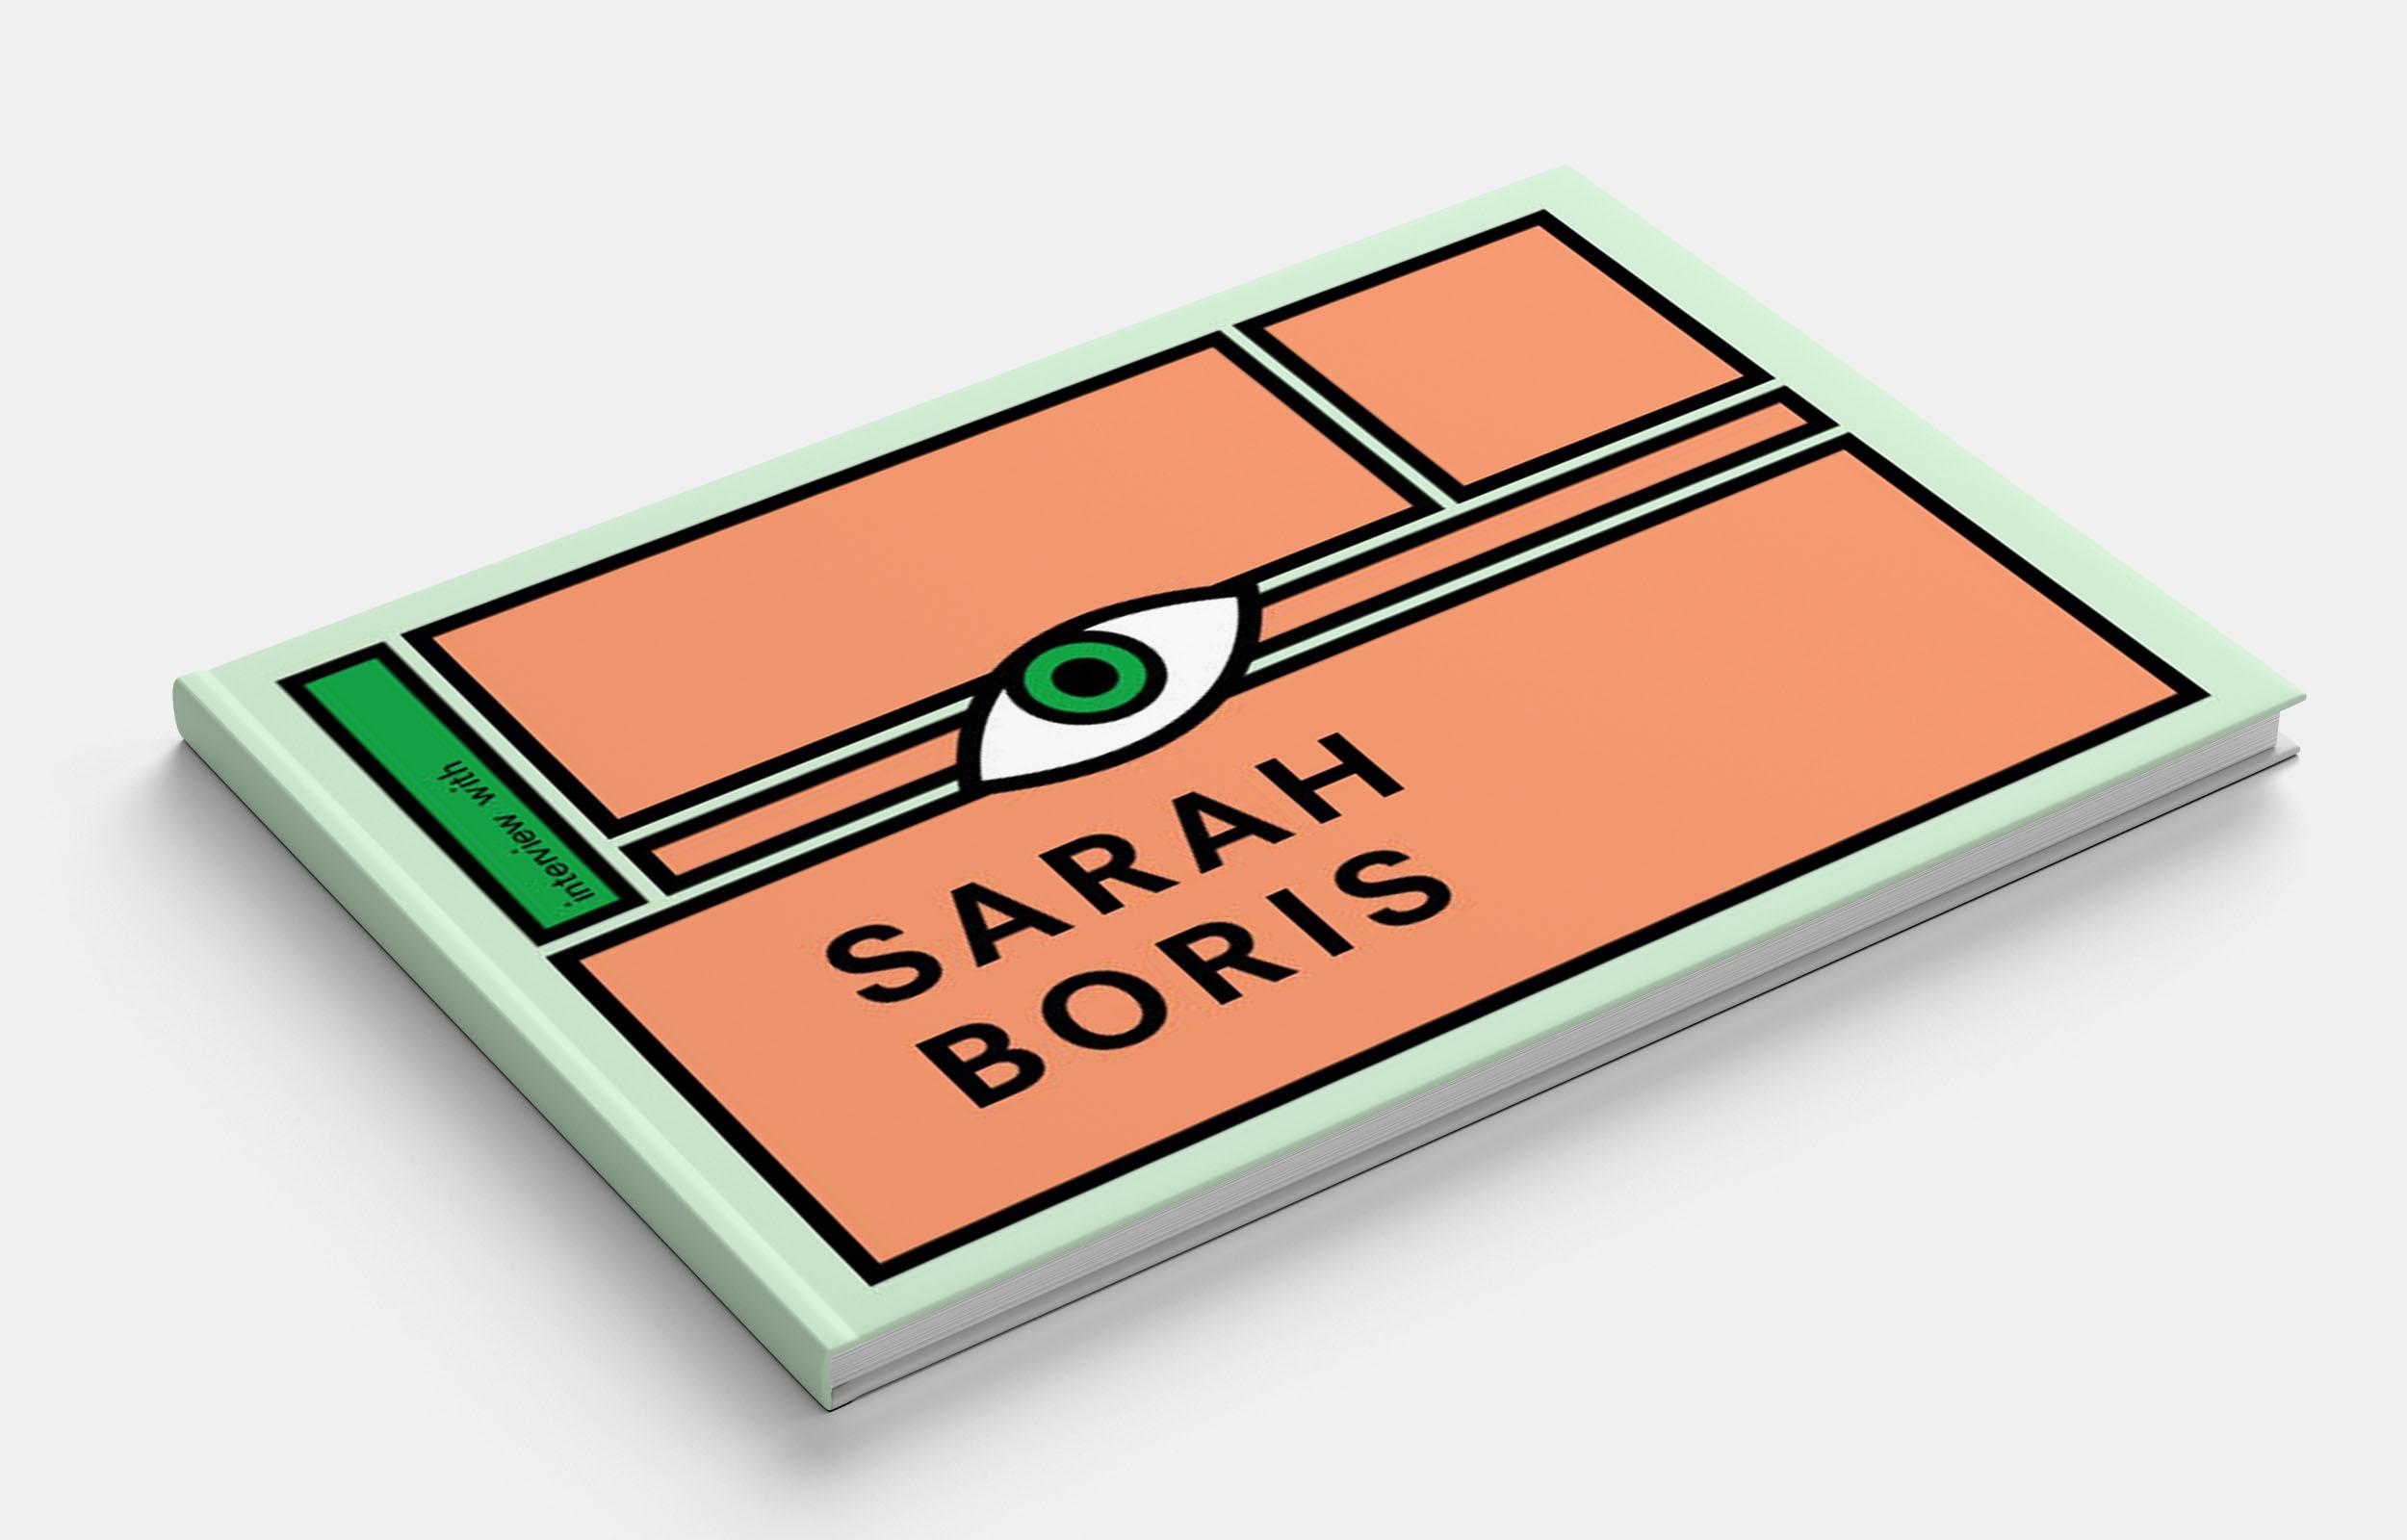 Srah Boris book